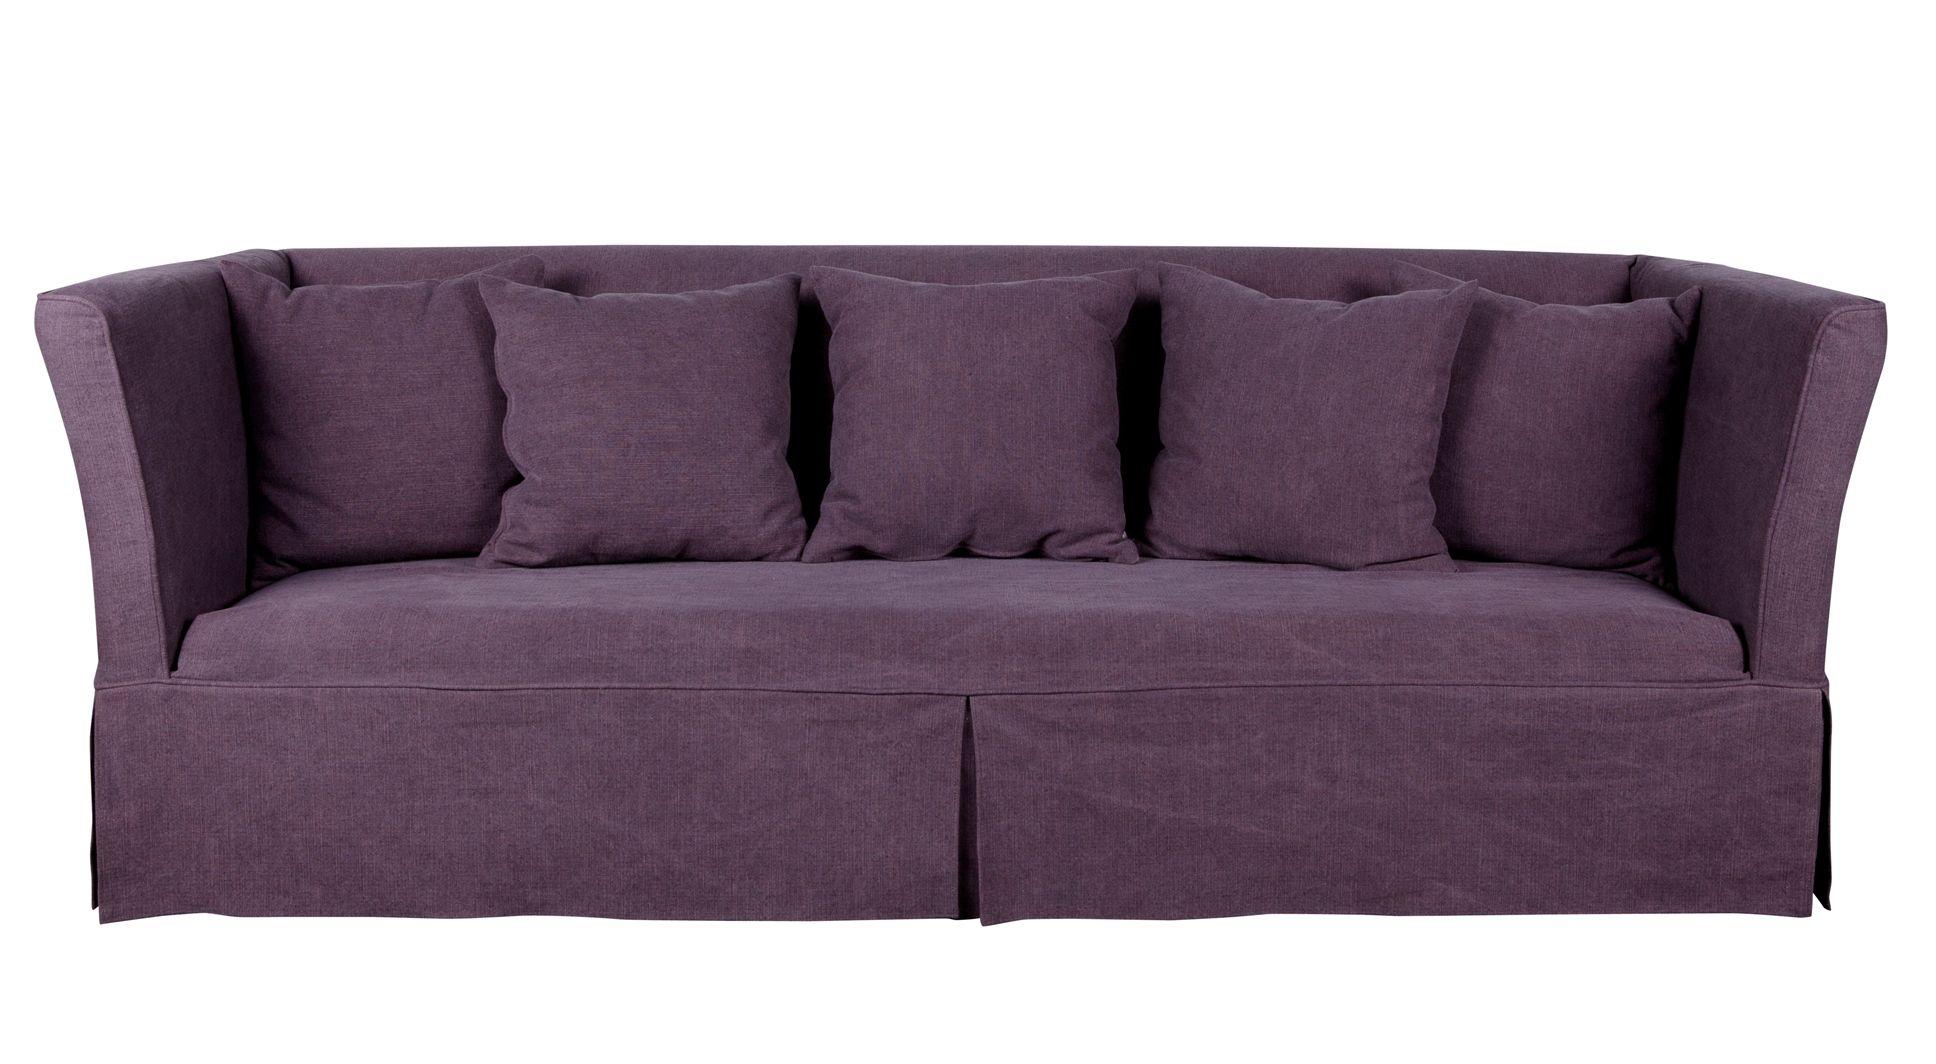 Sofa Tables Canap places Montreal Flamant L X P X H environ uac